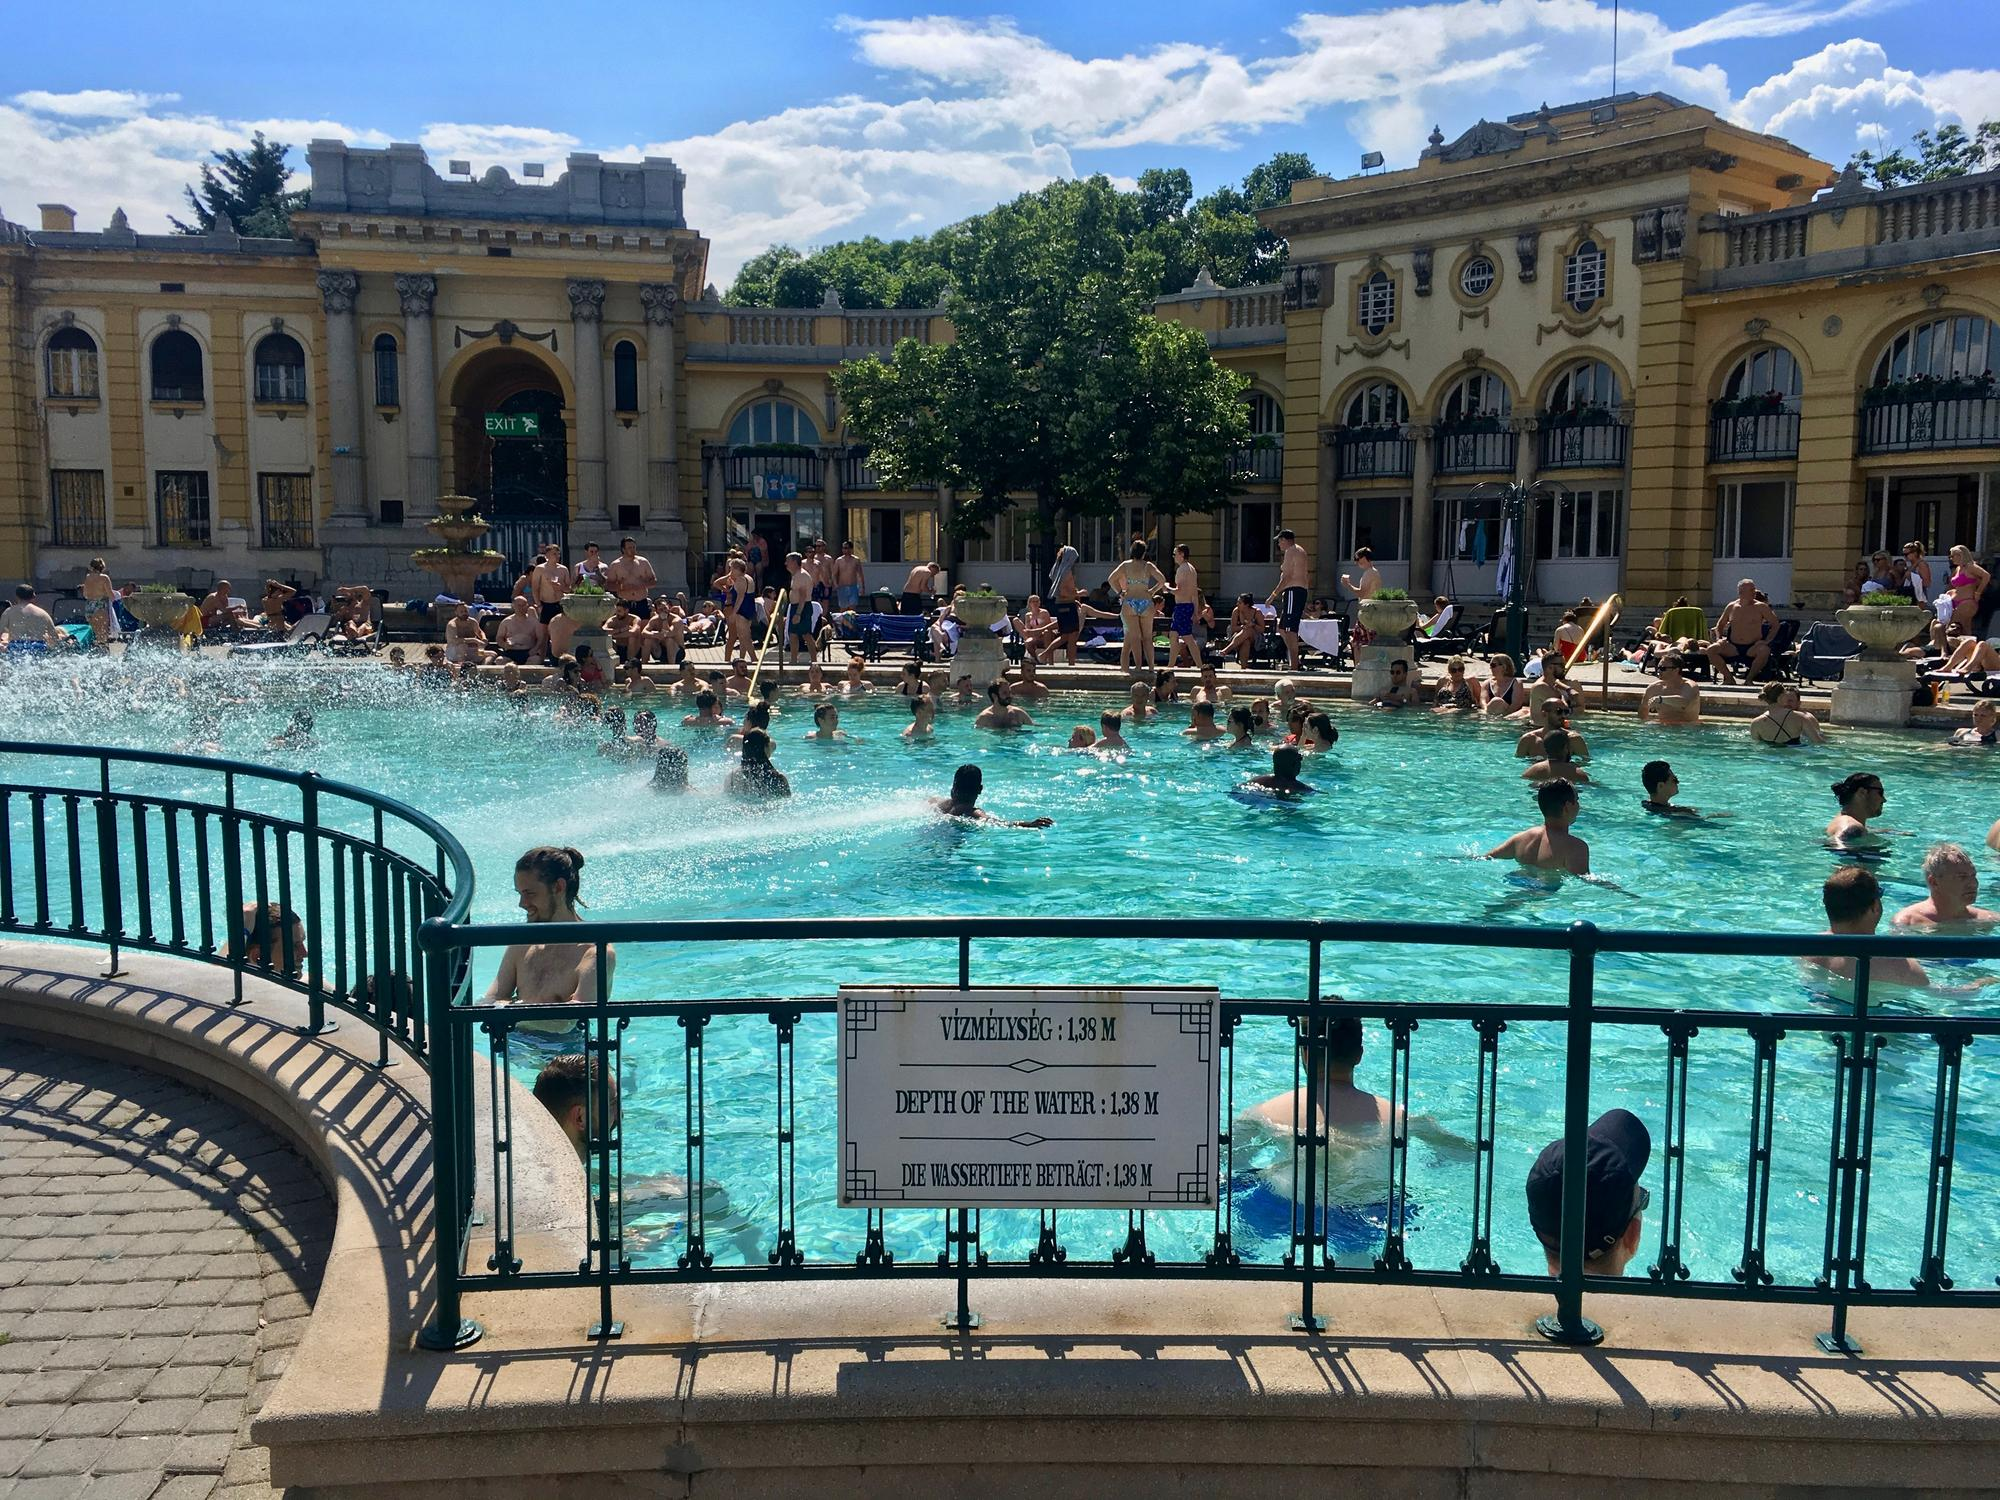 🇭🇺 Будапешт, Венгрия, май 2019.